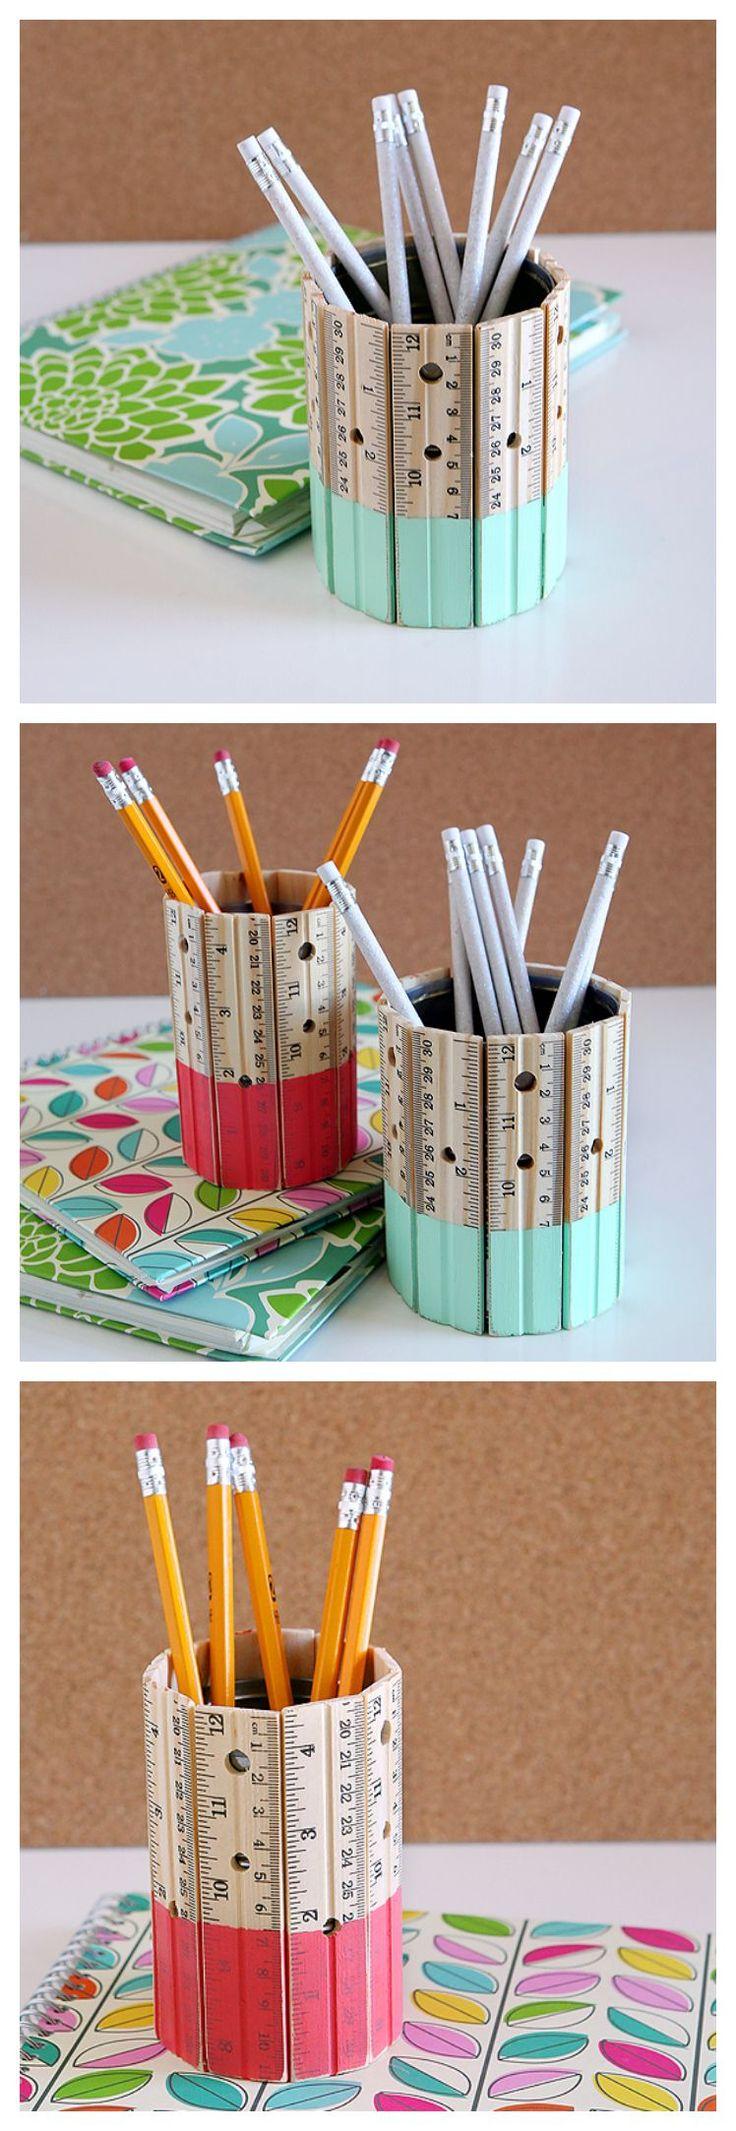 DIY Ruler Pencil Holder 332 best Teacher